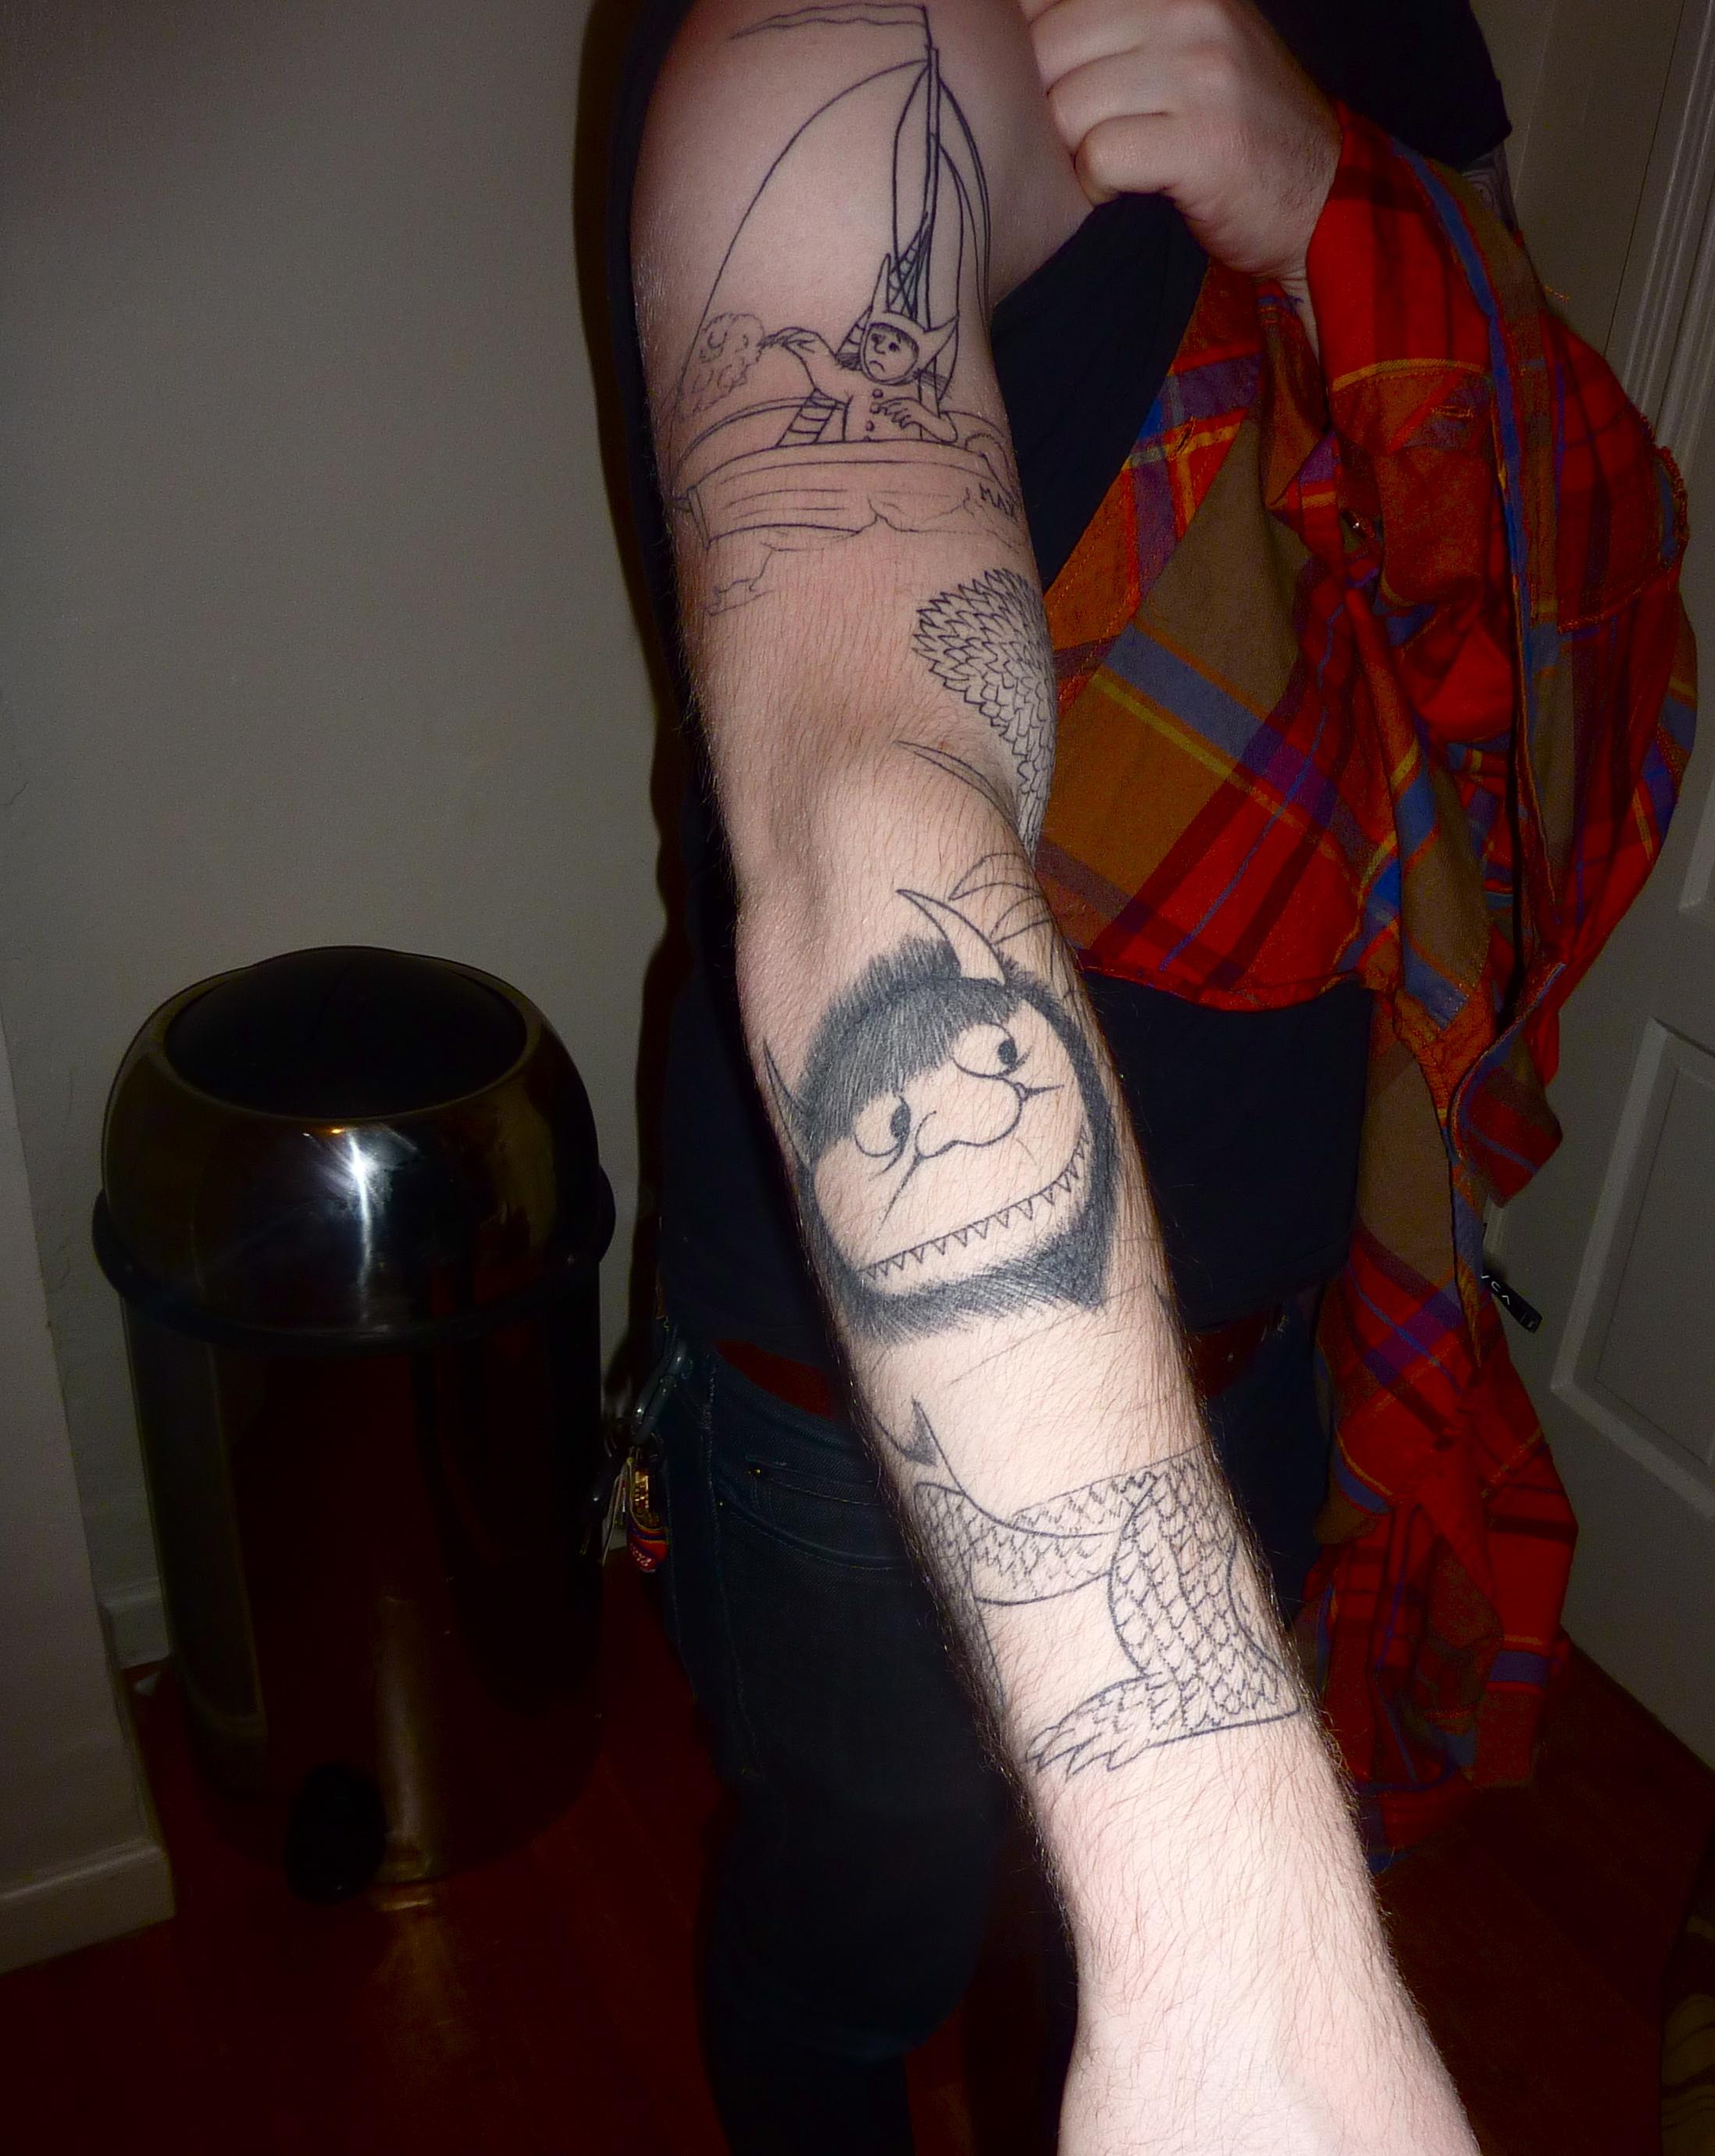 Where The Wild Things Are Tattoo Capslockkills